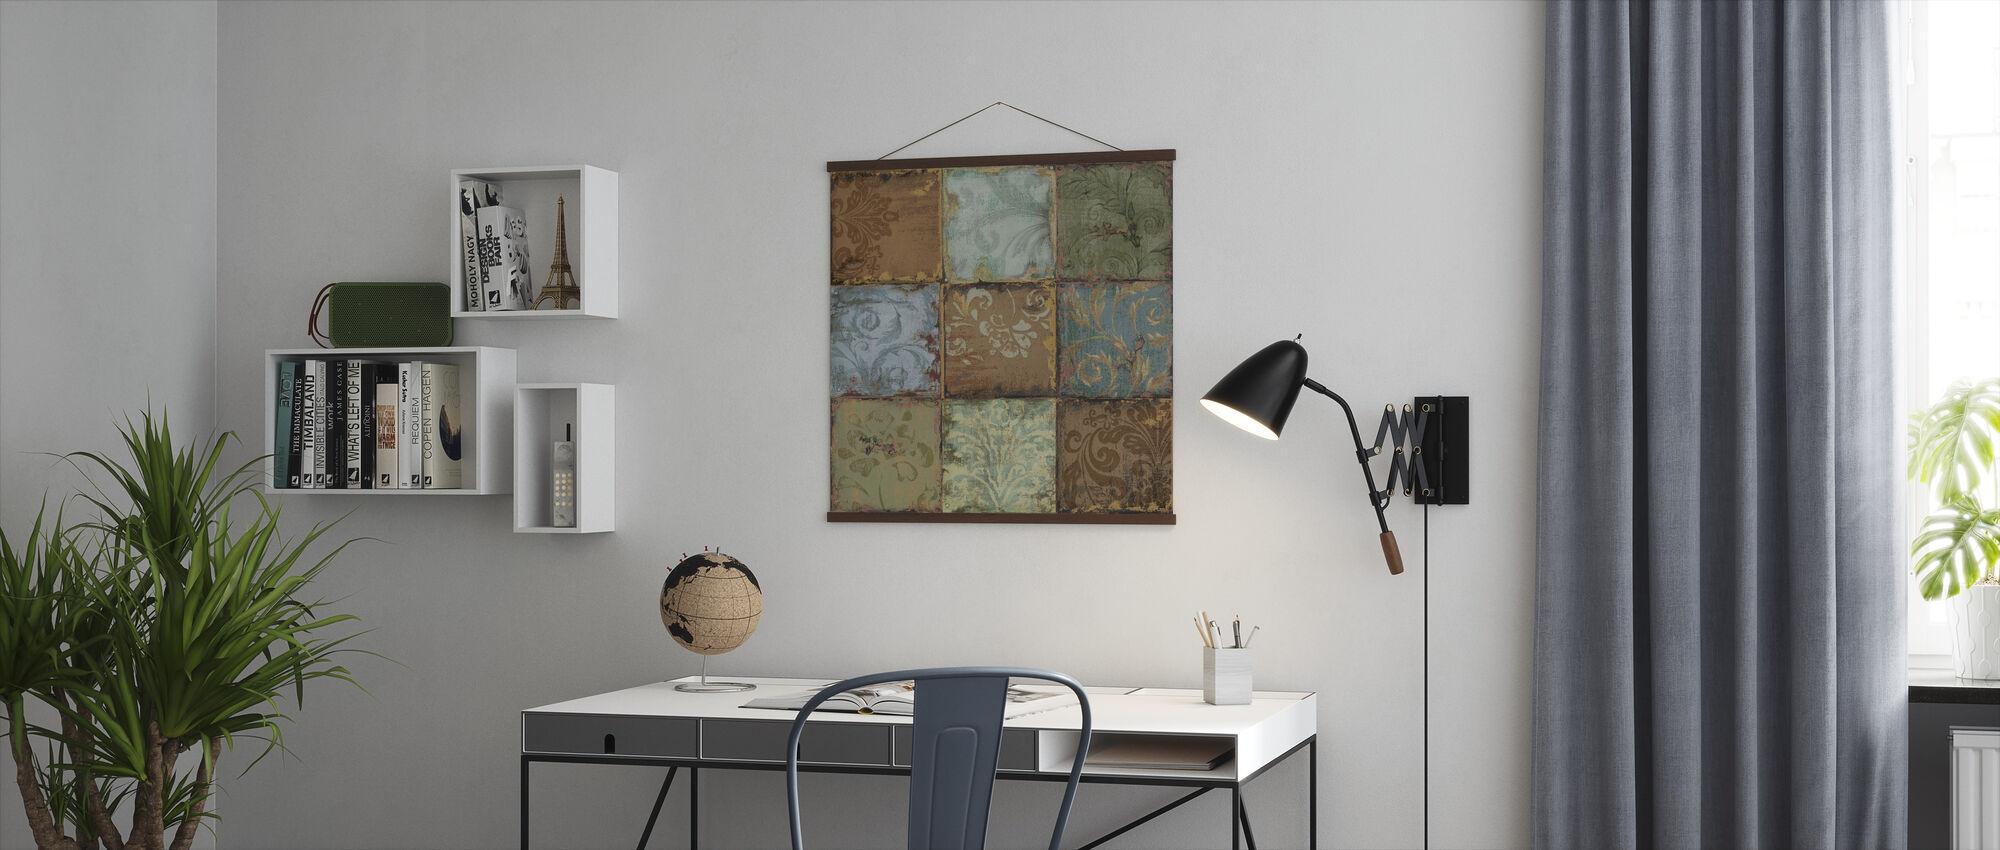 Tapestry Plattor 2 - Poster - Kontor